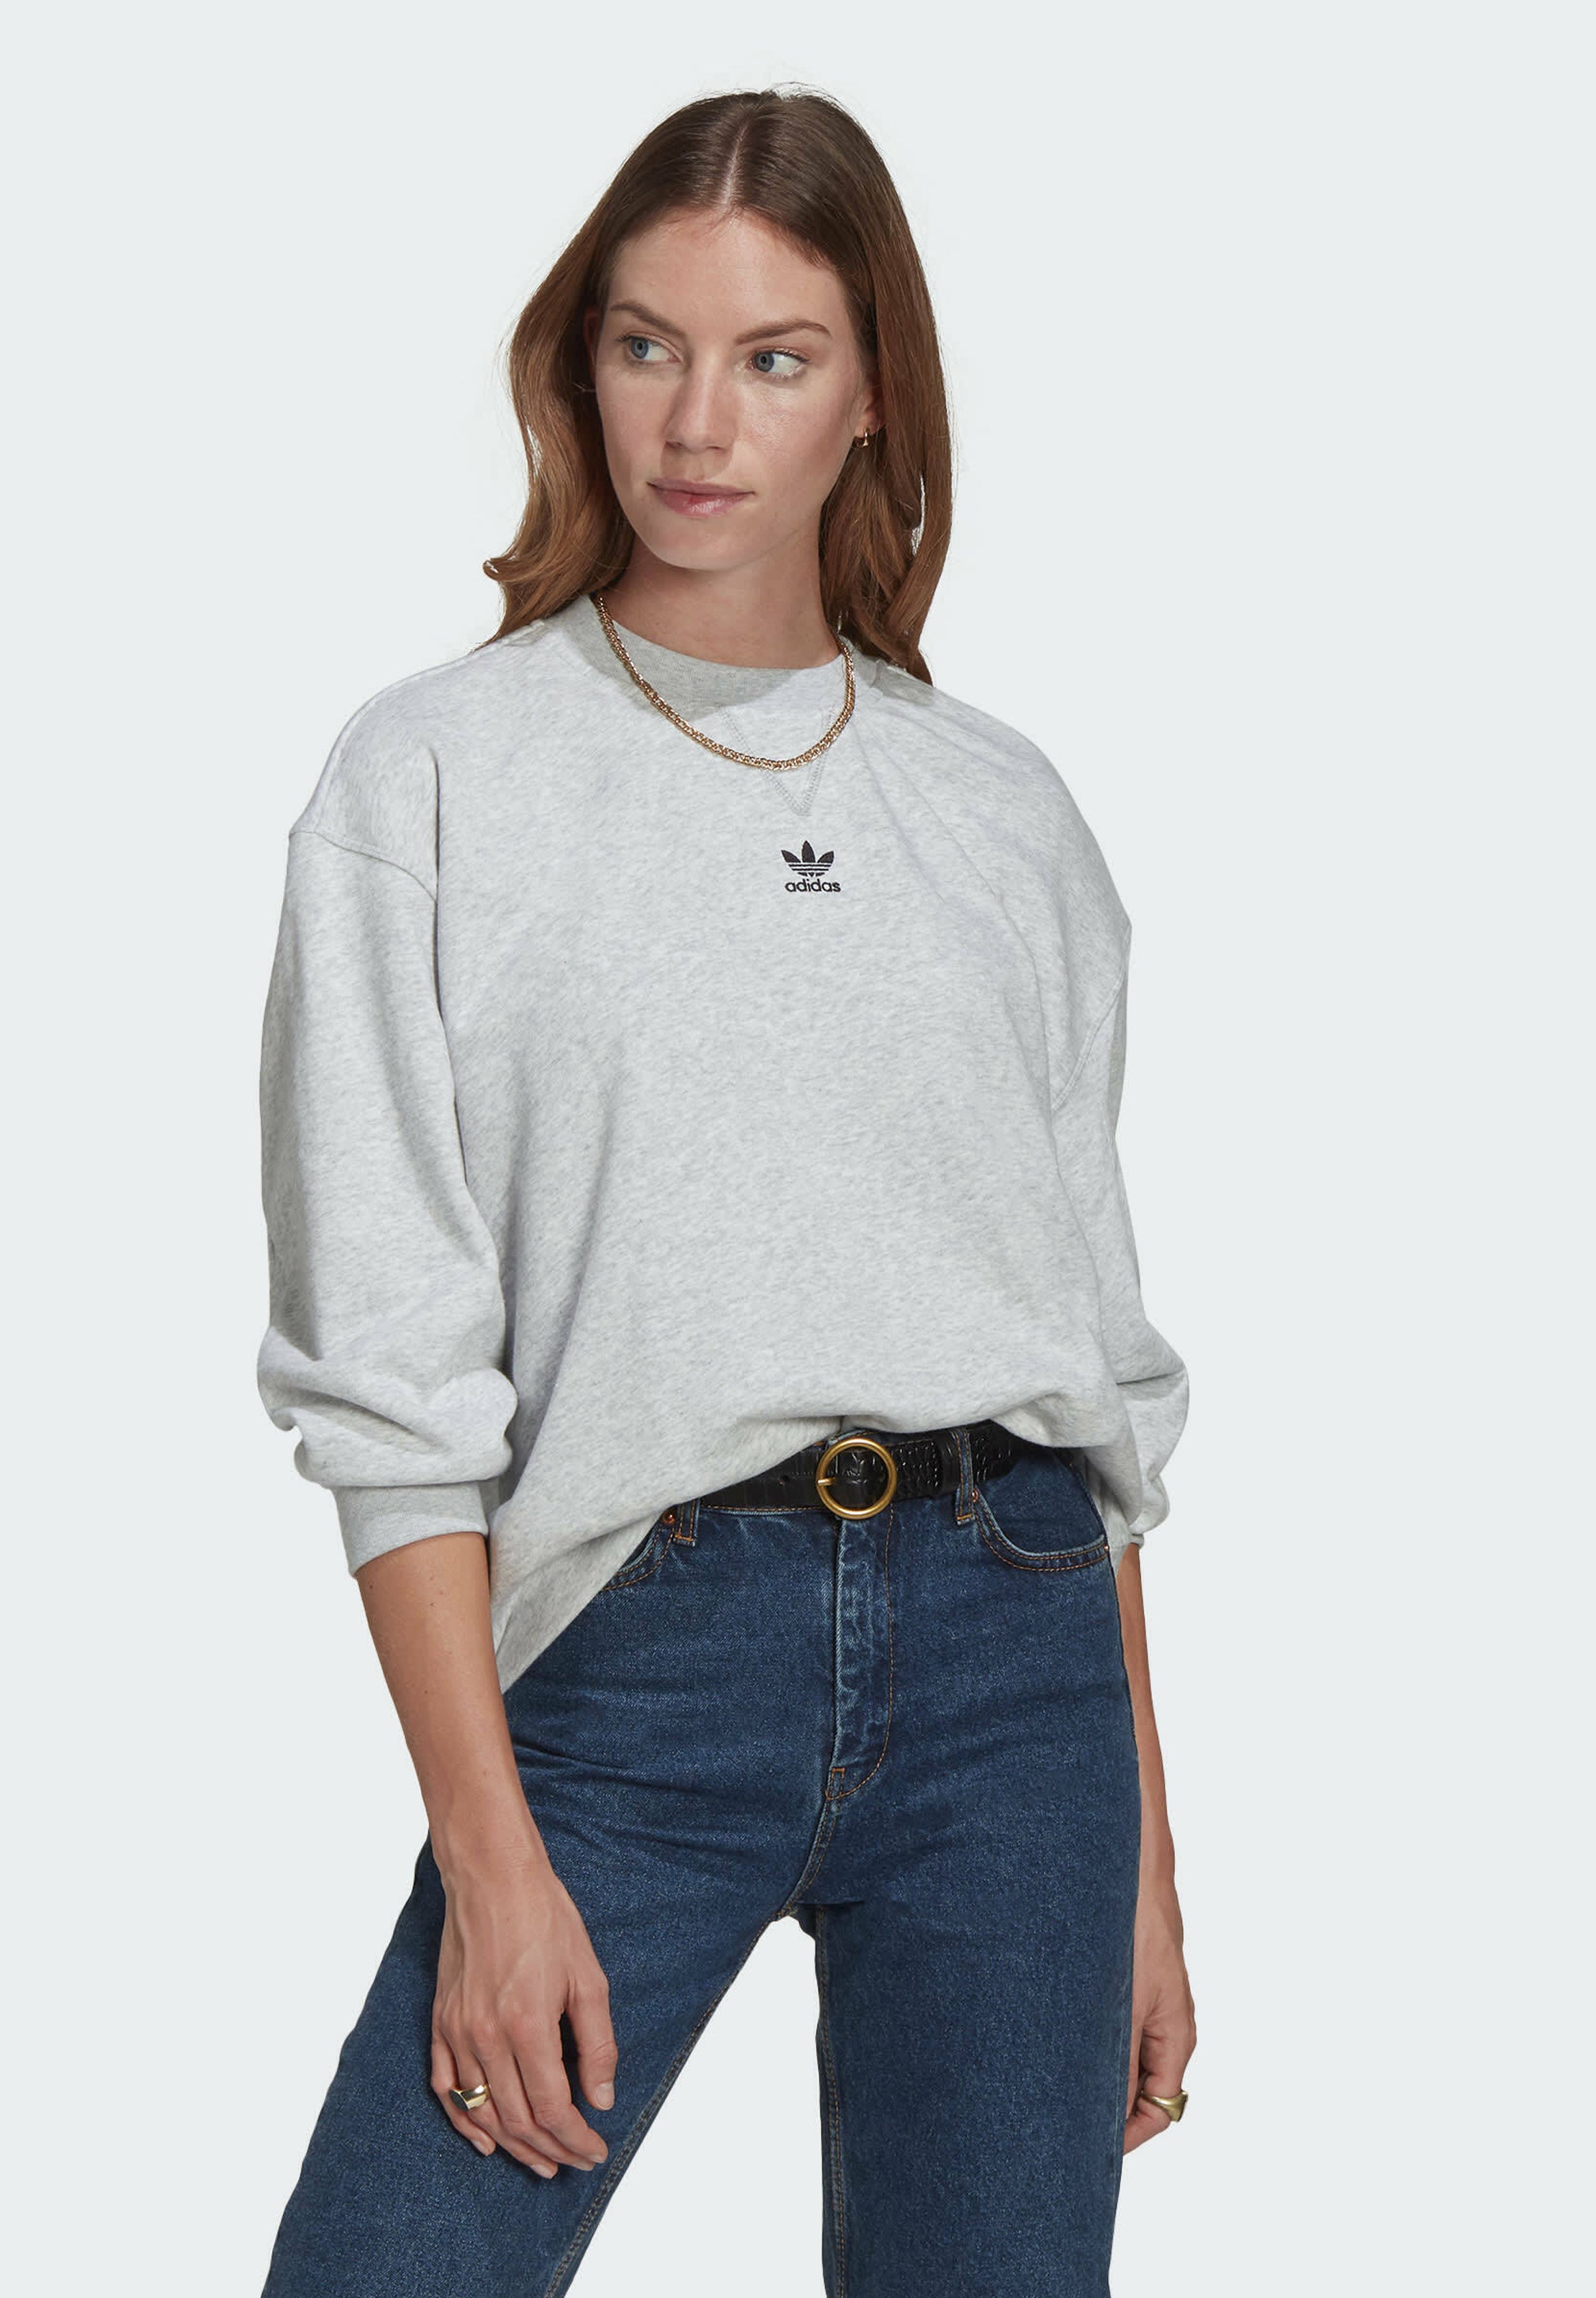 Femme LOUNGEWEAR ADICOLOR ESSENTIALS SWEATSHIRT - Sweatshirt